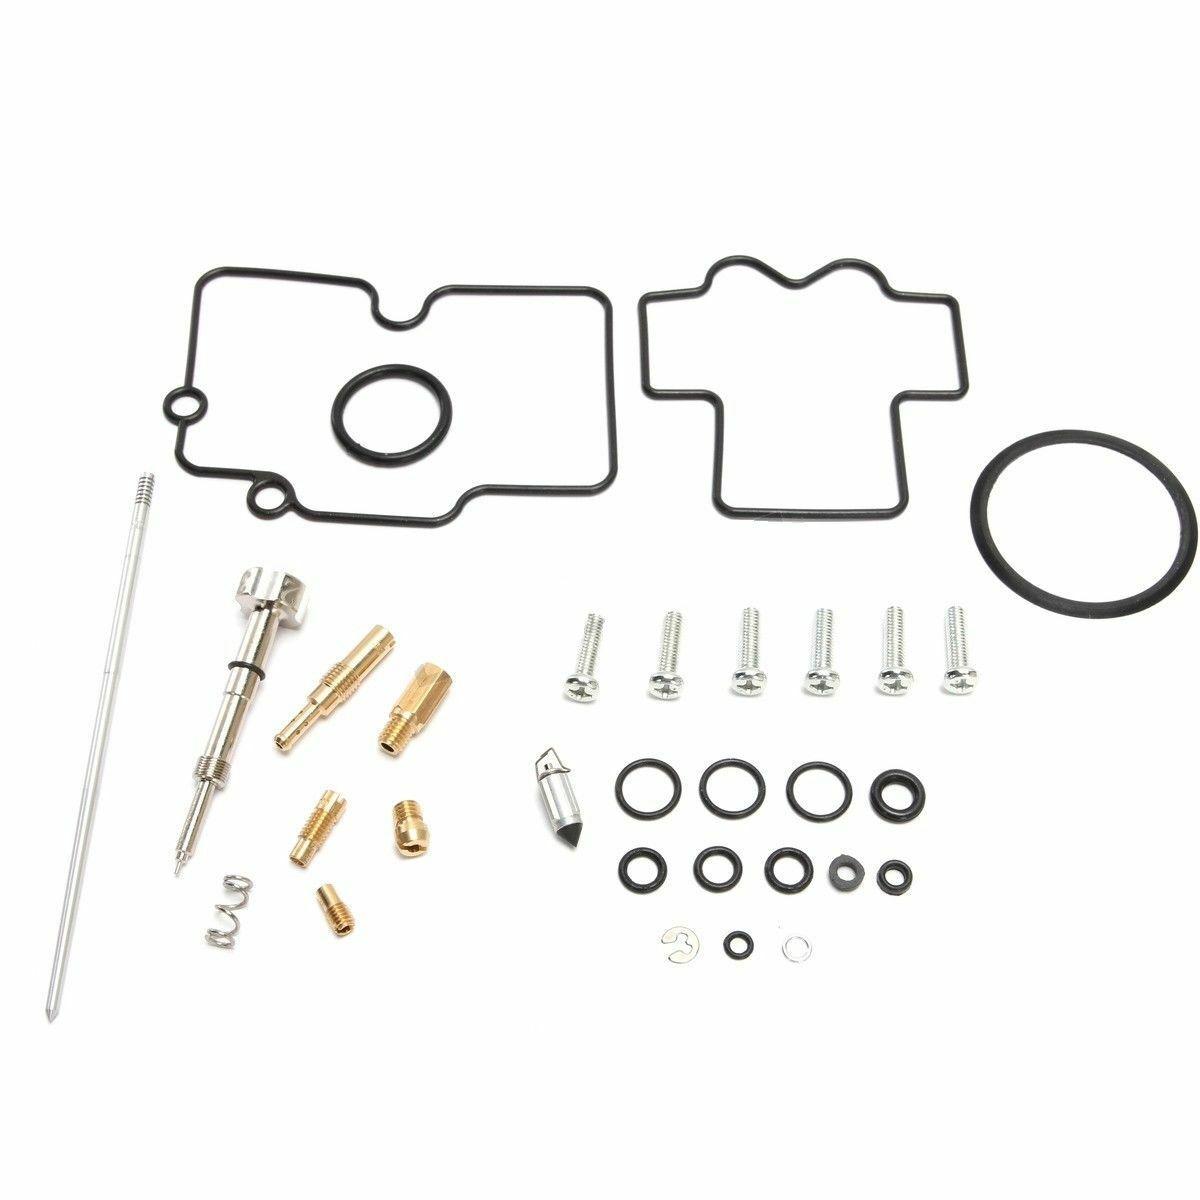 New Carburetor Rebuild Kit Honda TRX450R 450cc 2006